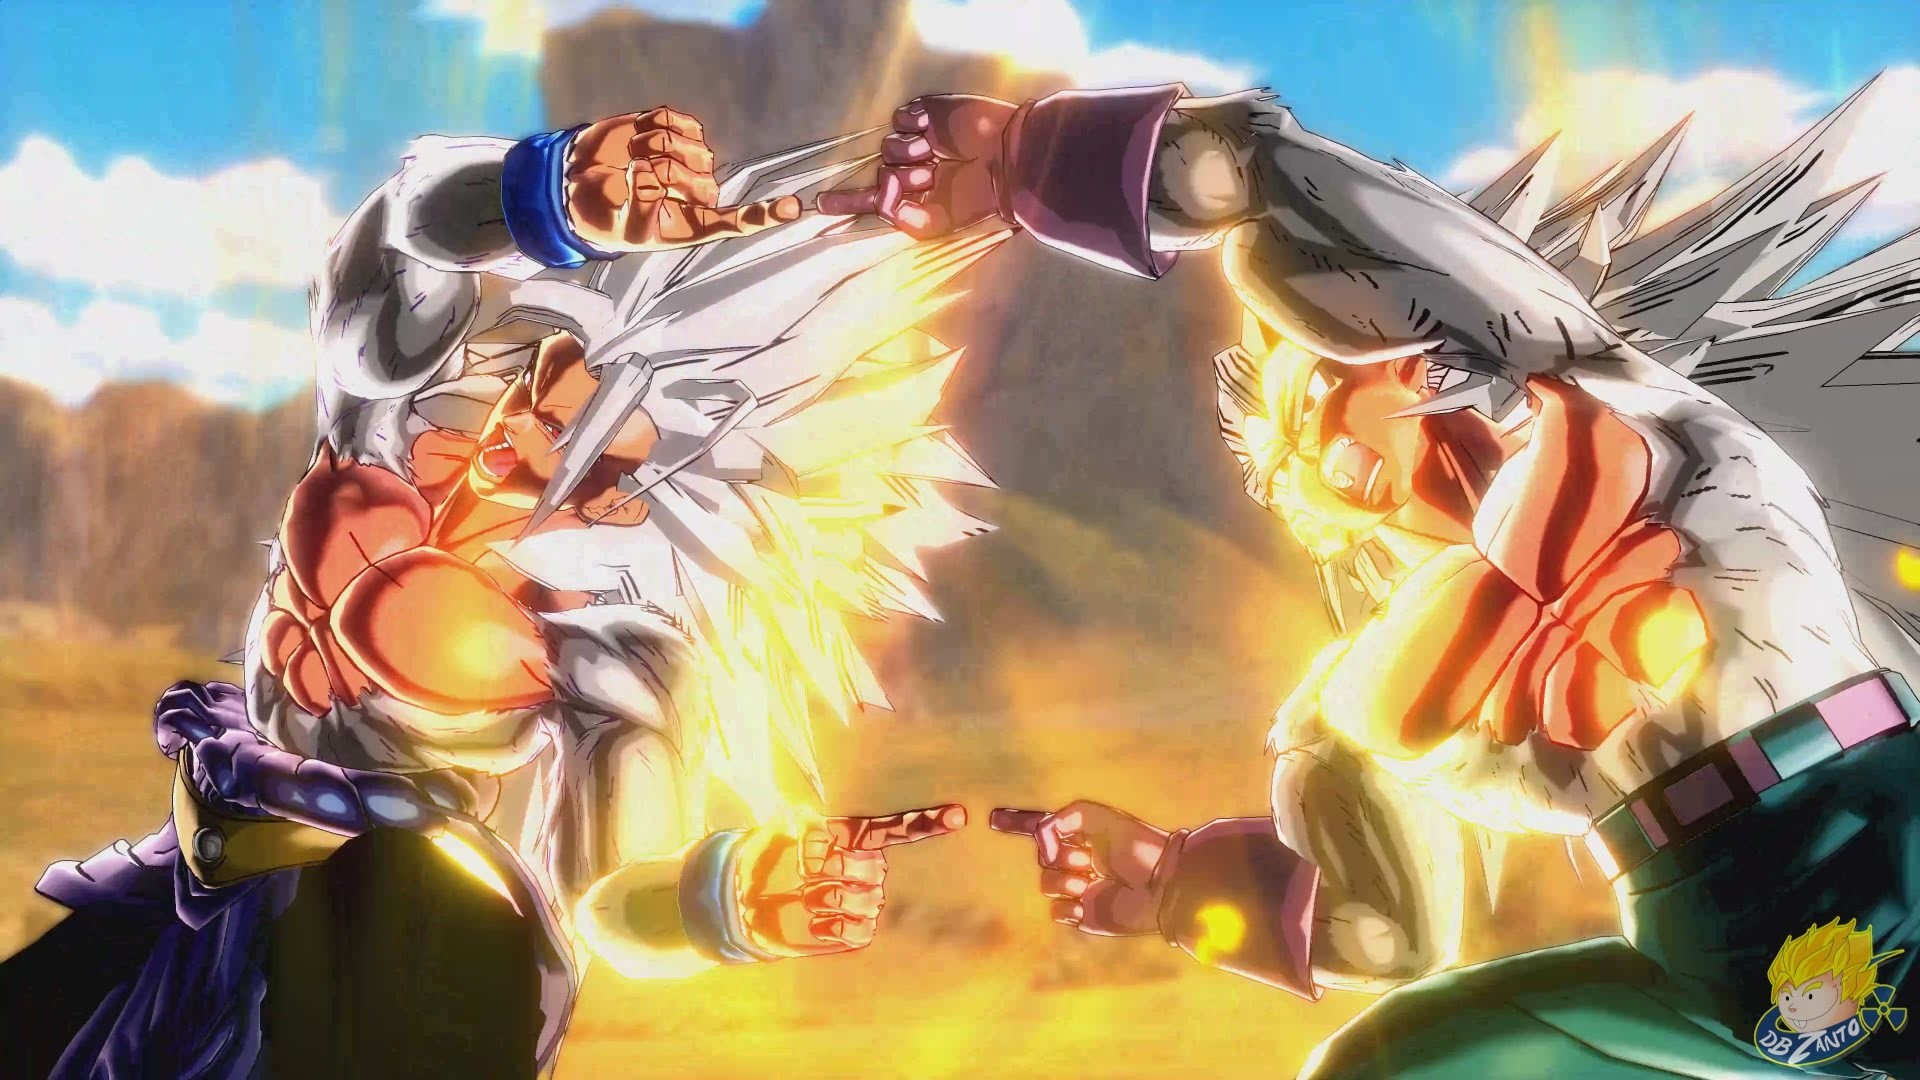 Dragon Ball Xenoverse (PC) : Super Saiyan 5 Gogeta Transformation【60FPS  1080P】 – YouTube